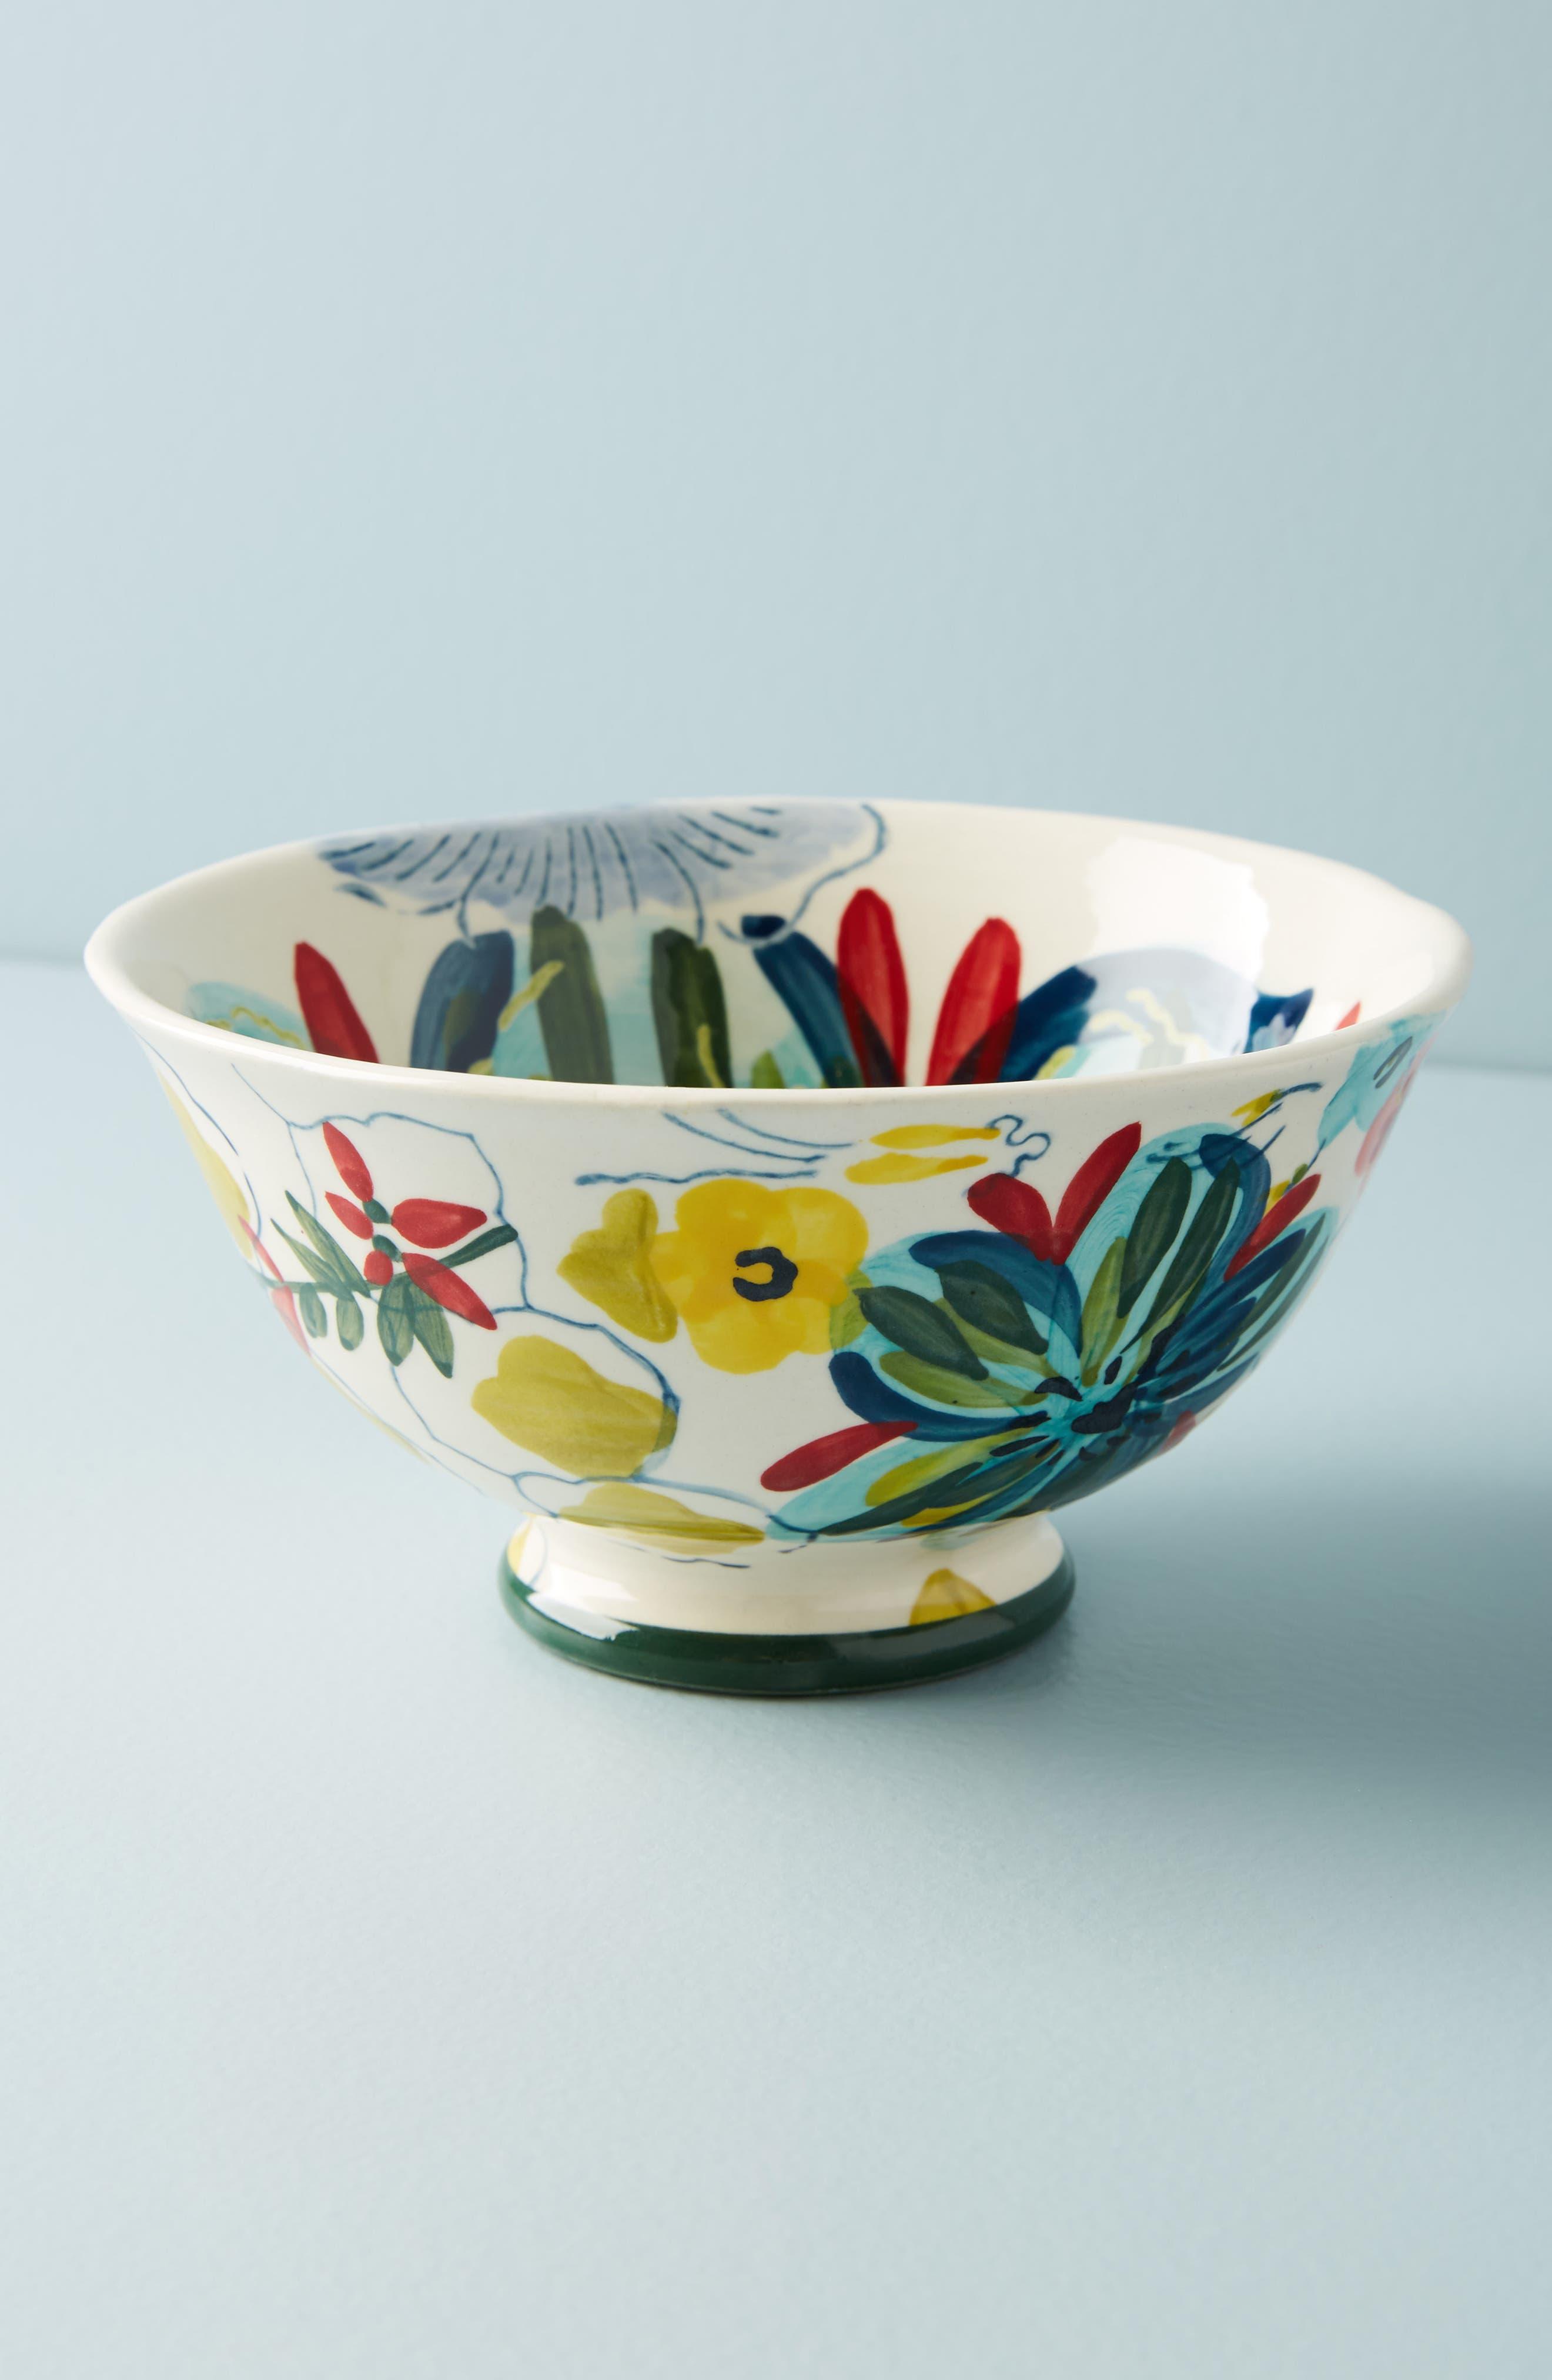 Sissinghurst Castle Stoneware Cereal Bowl,                         Main,                         color, Navy Multi